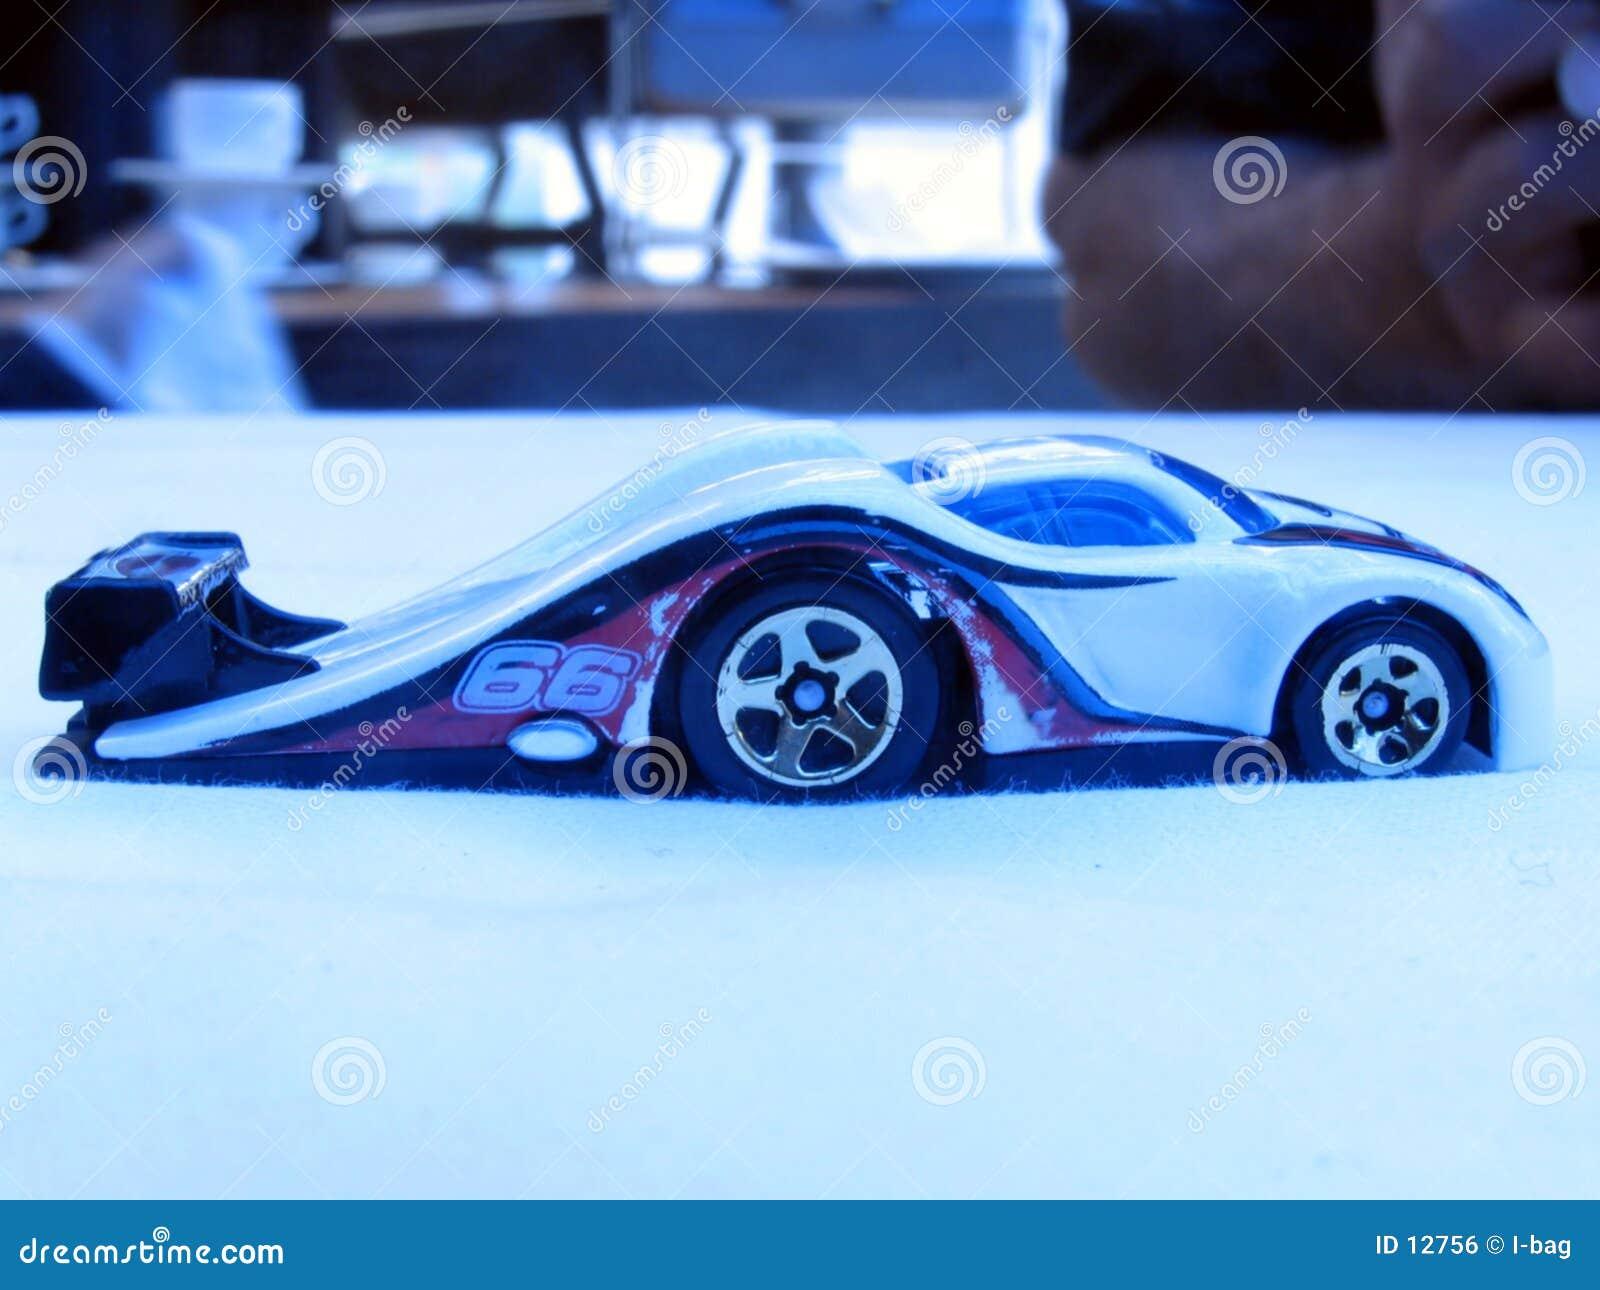 Waved toy car